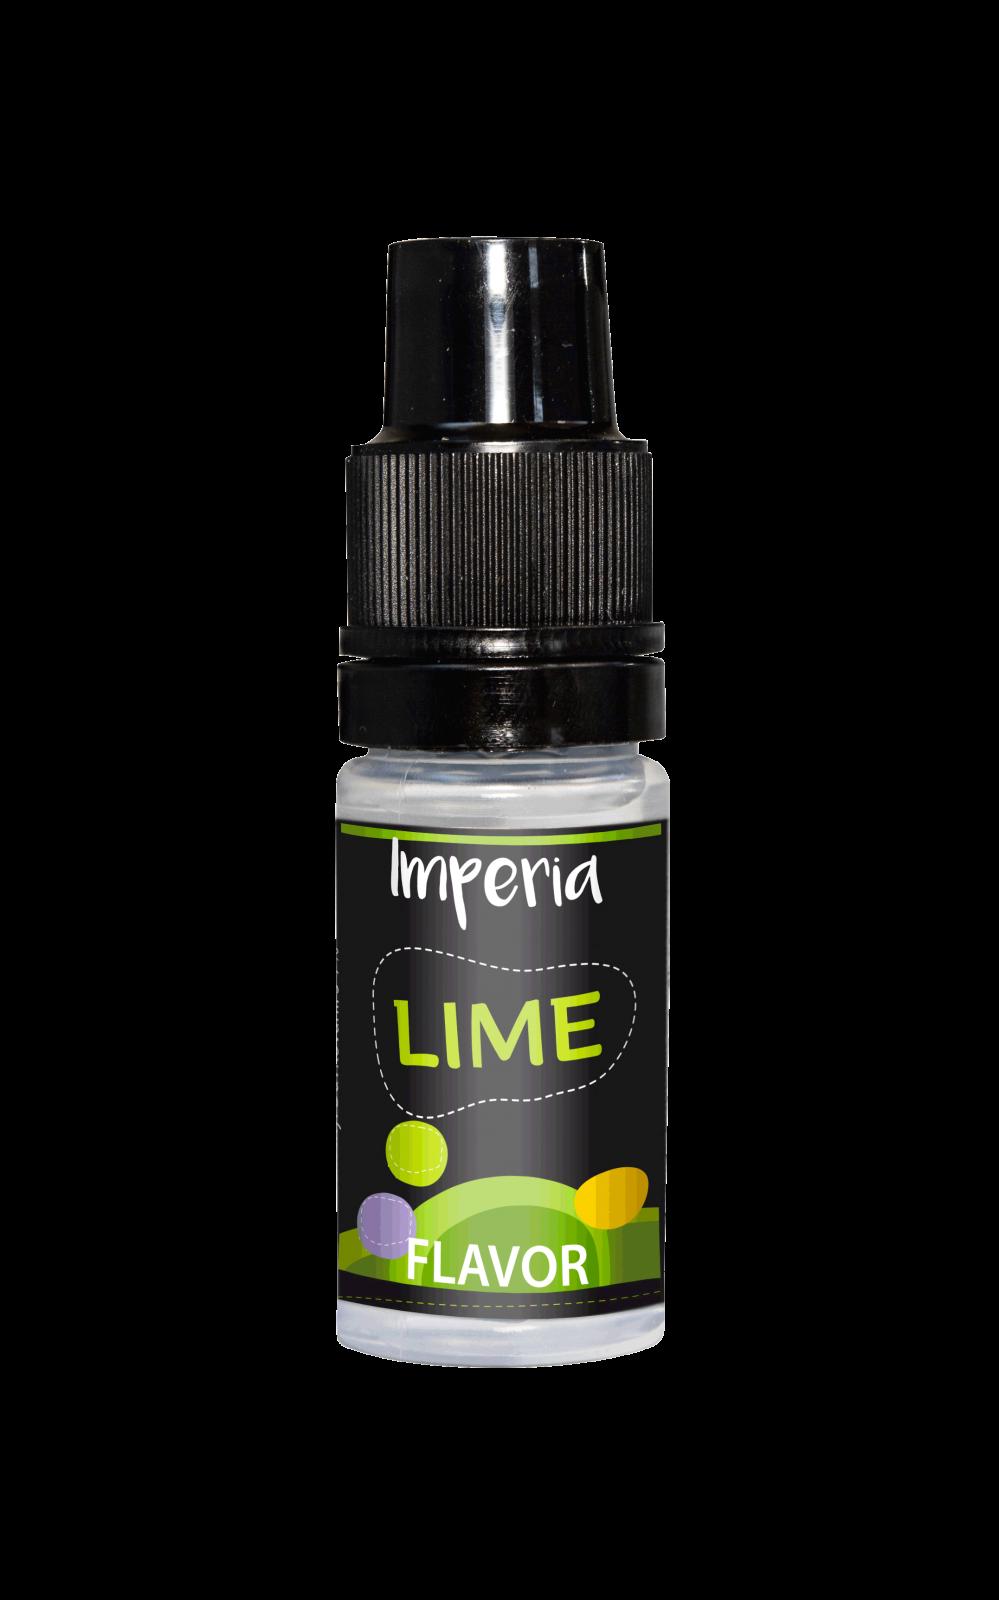 Lime - Aroma Imperia Black Label Boudoir Samadhi s.r.o.